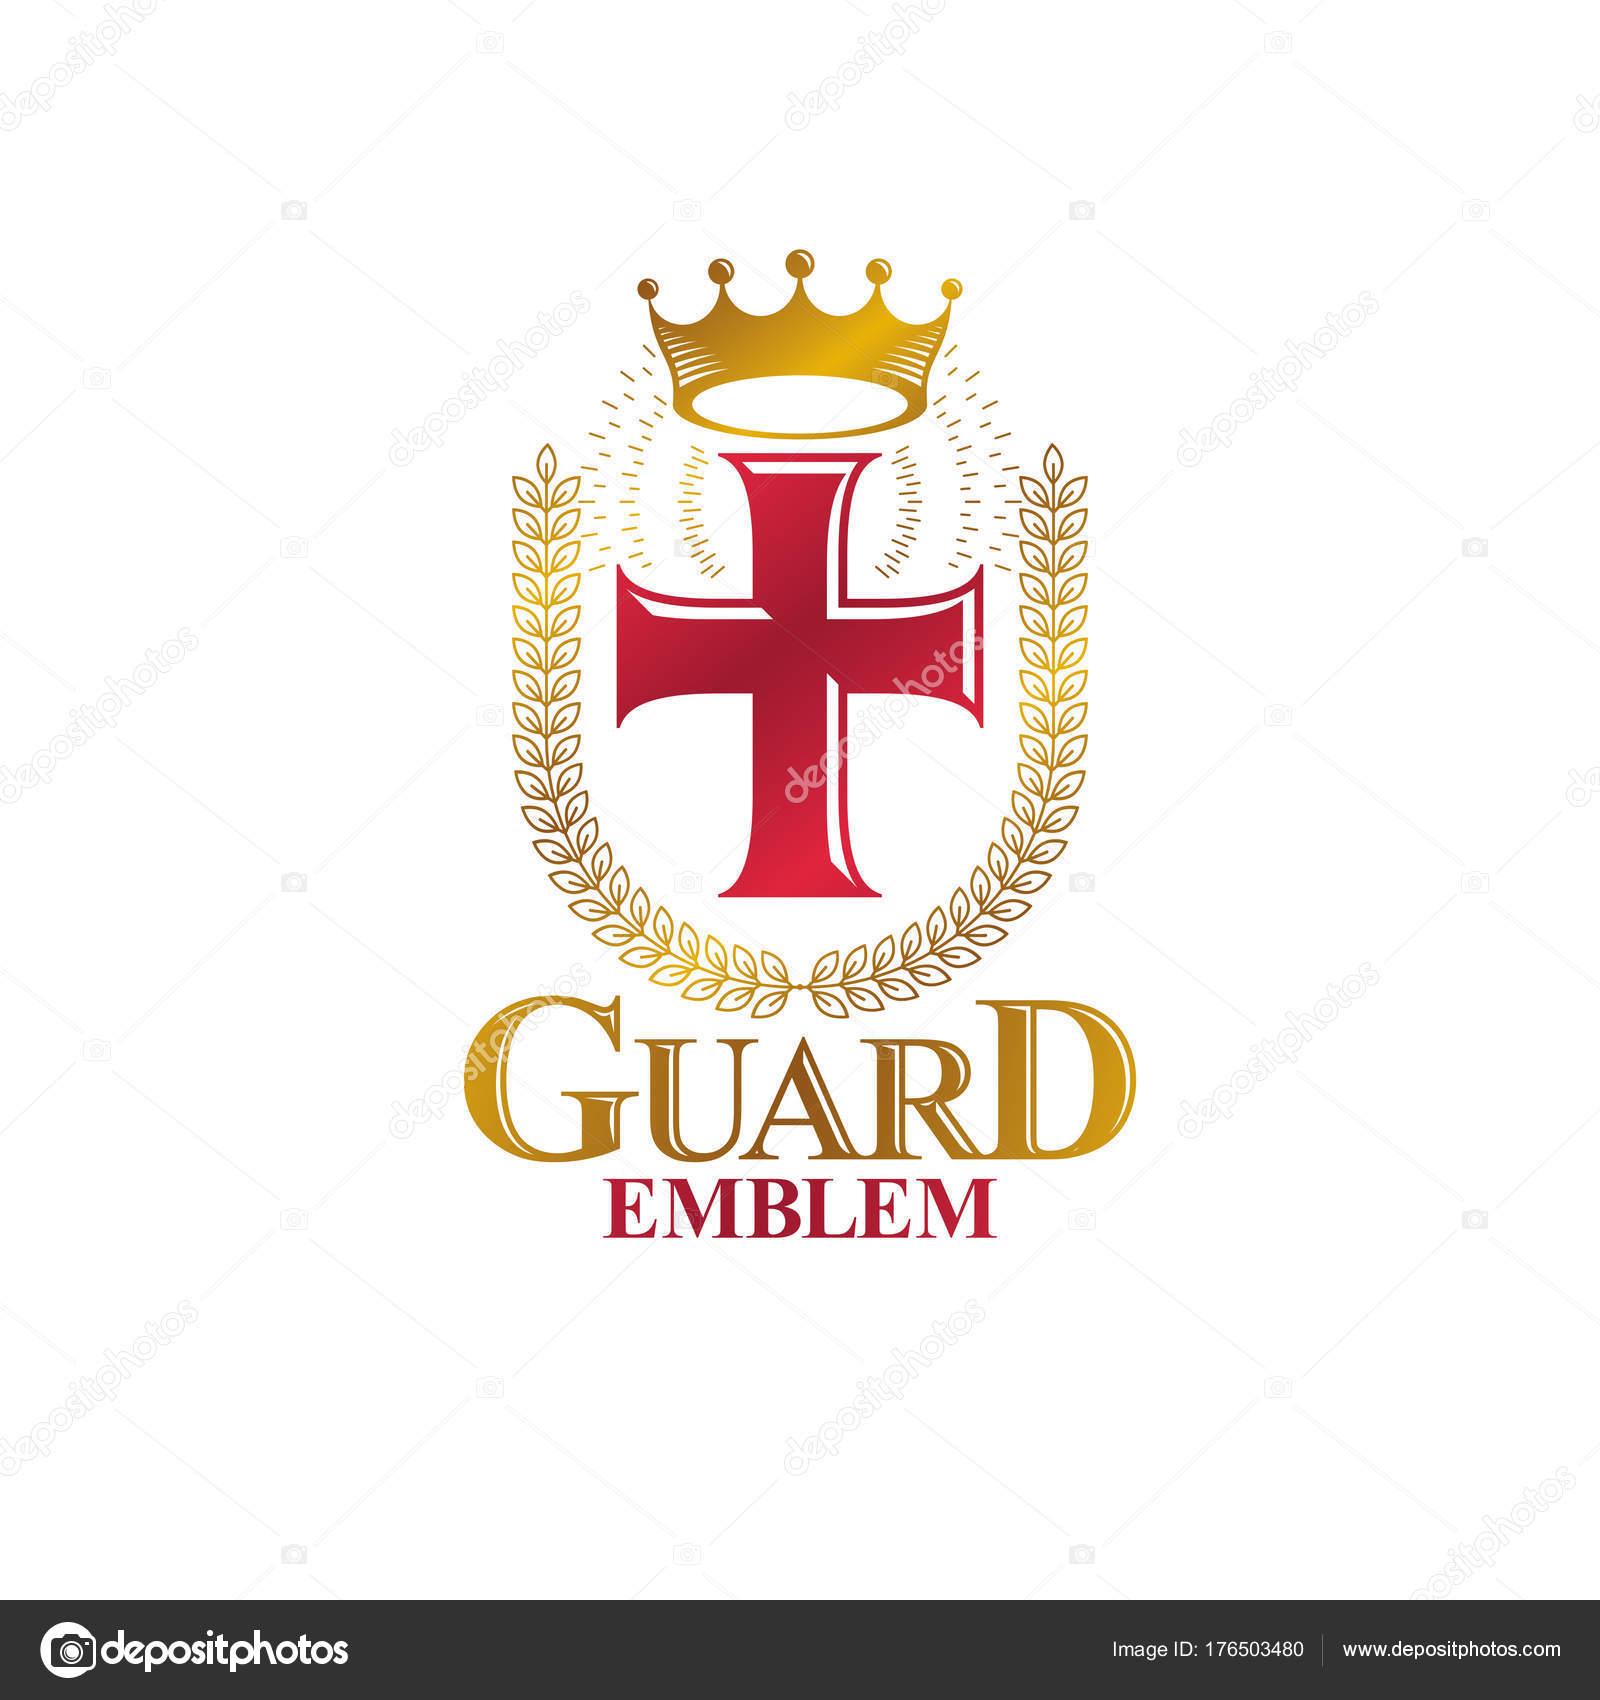 Christian Cross Golden Emblem Created Royal Crown Laurel Wreath